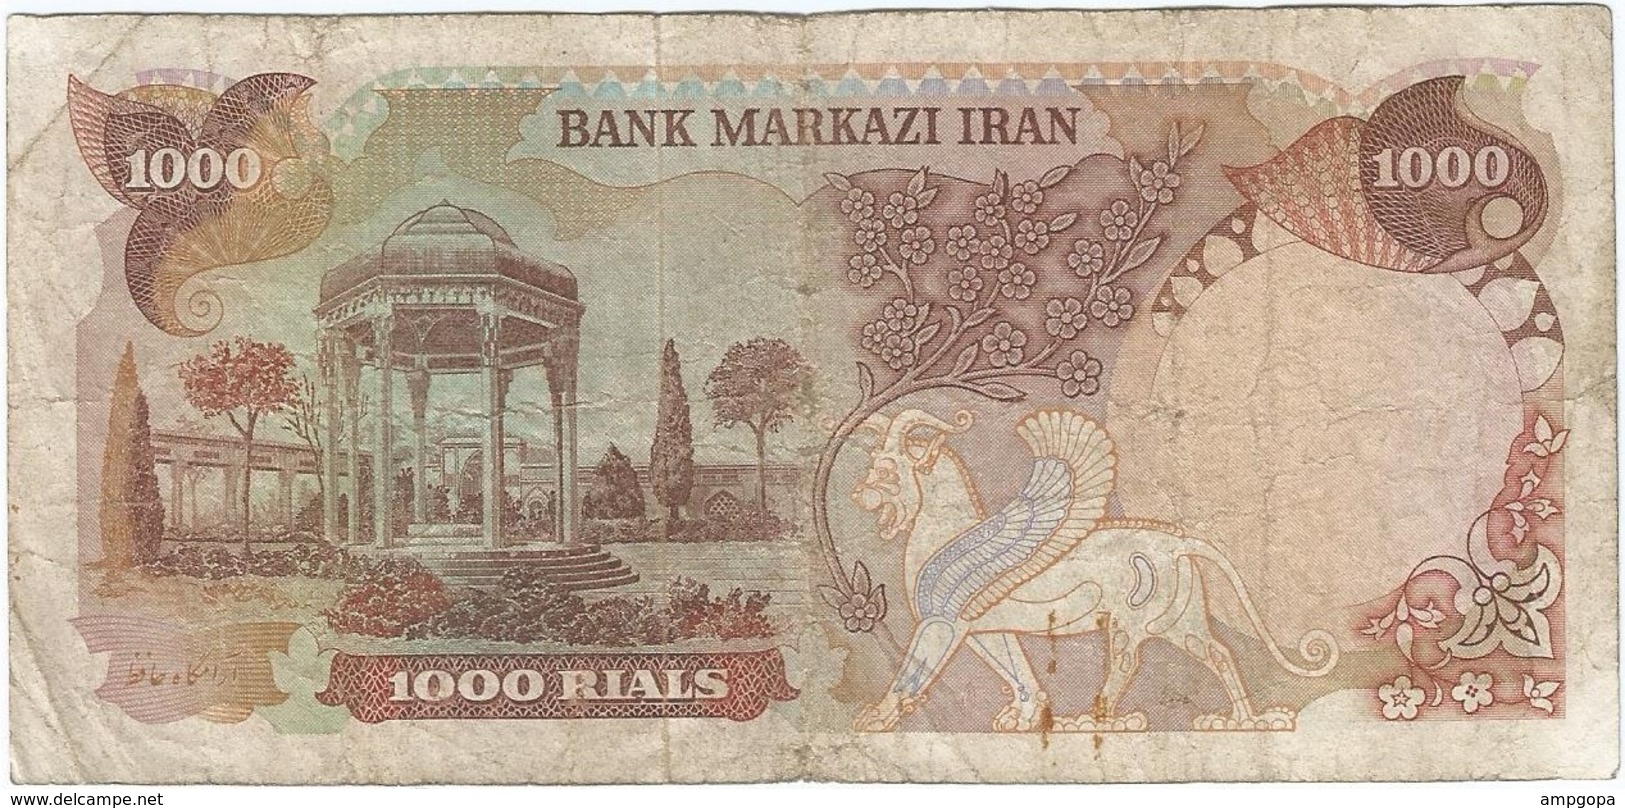 Irán 1000 Rials 1974 Pick 105a Ref 2 - Irán